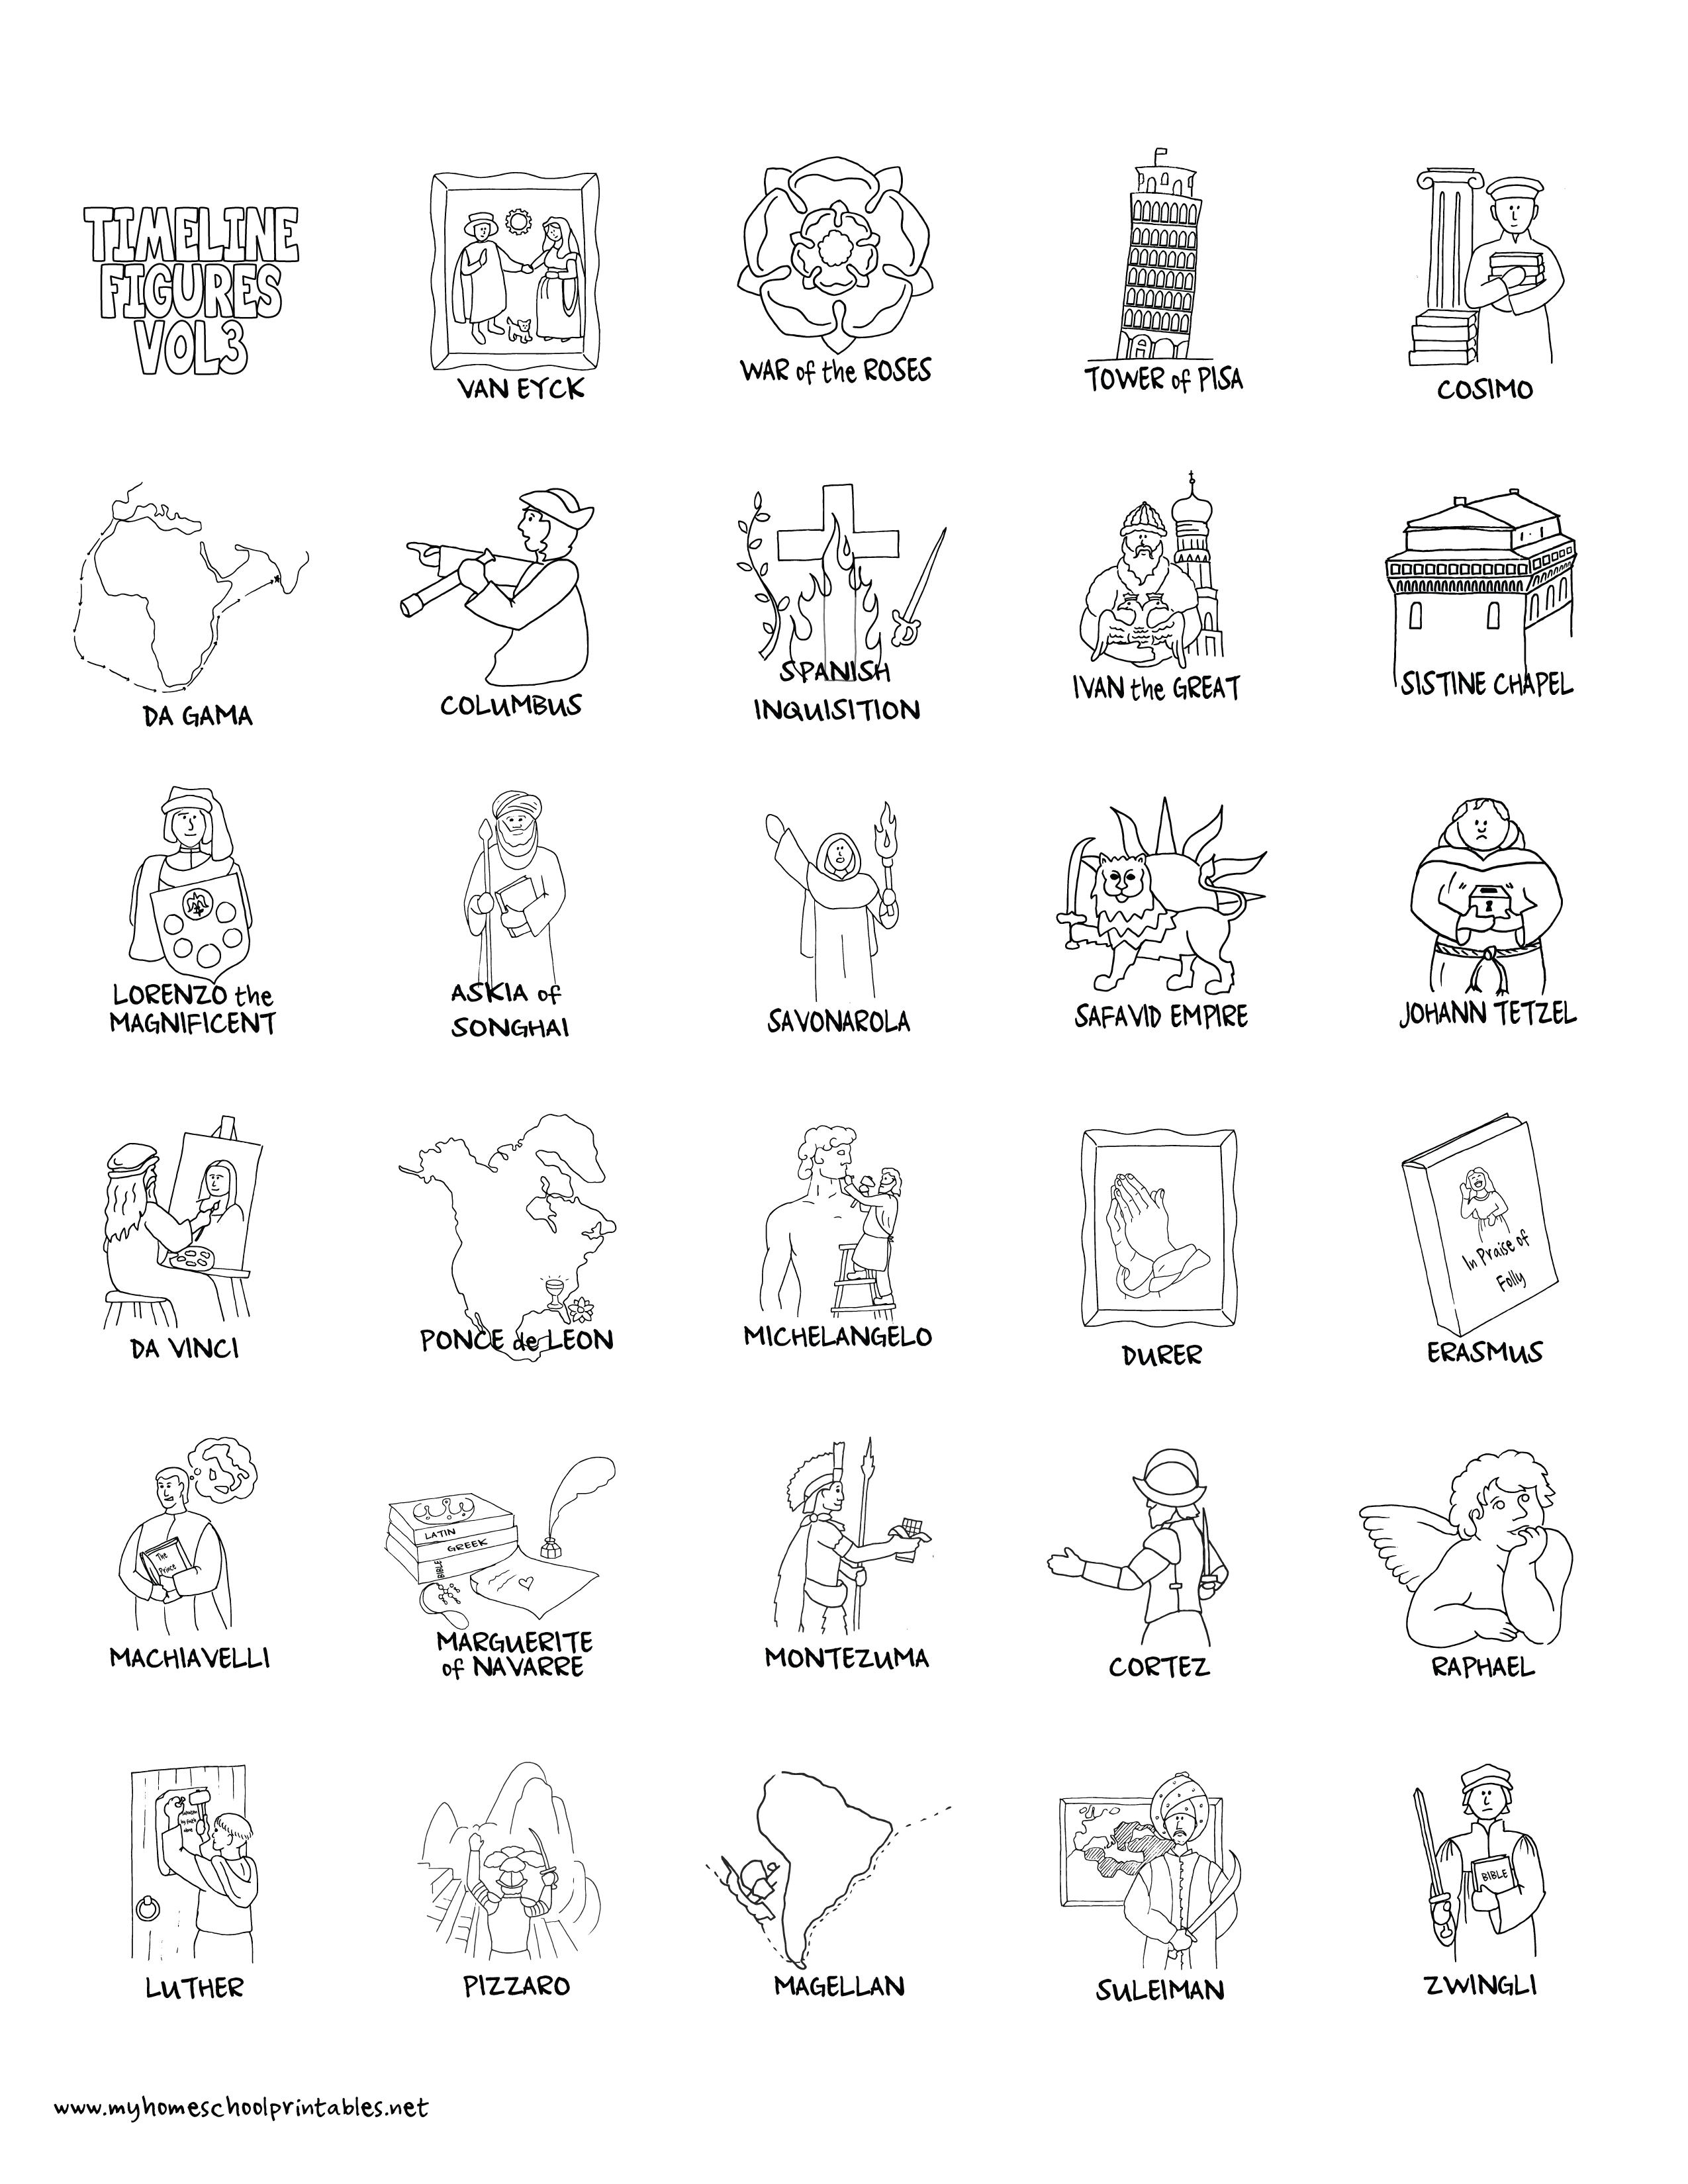 My Homeschool Printables » Timeline Figures – Volume 3 - Free Printable Timeline Figures